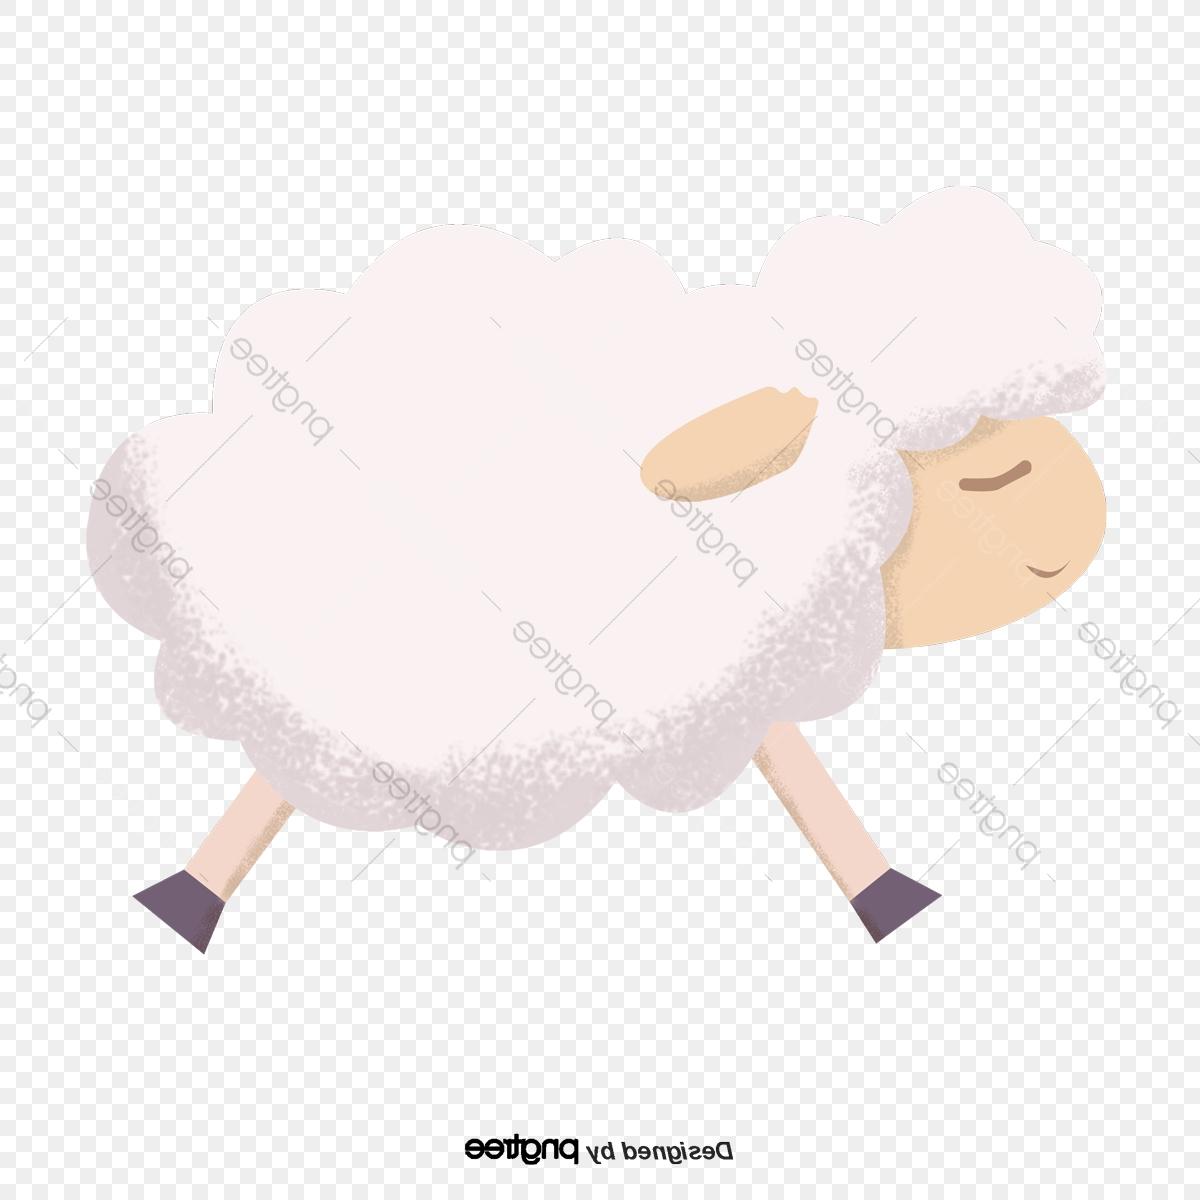 Gambar Domba Kecil Yang Lucu, Clipart Kambing, Ladang throughout Gambar Domba Animasi